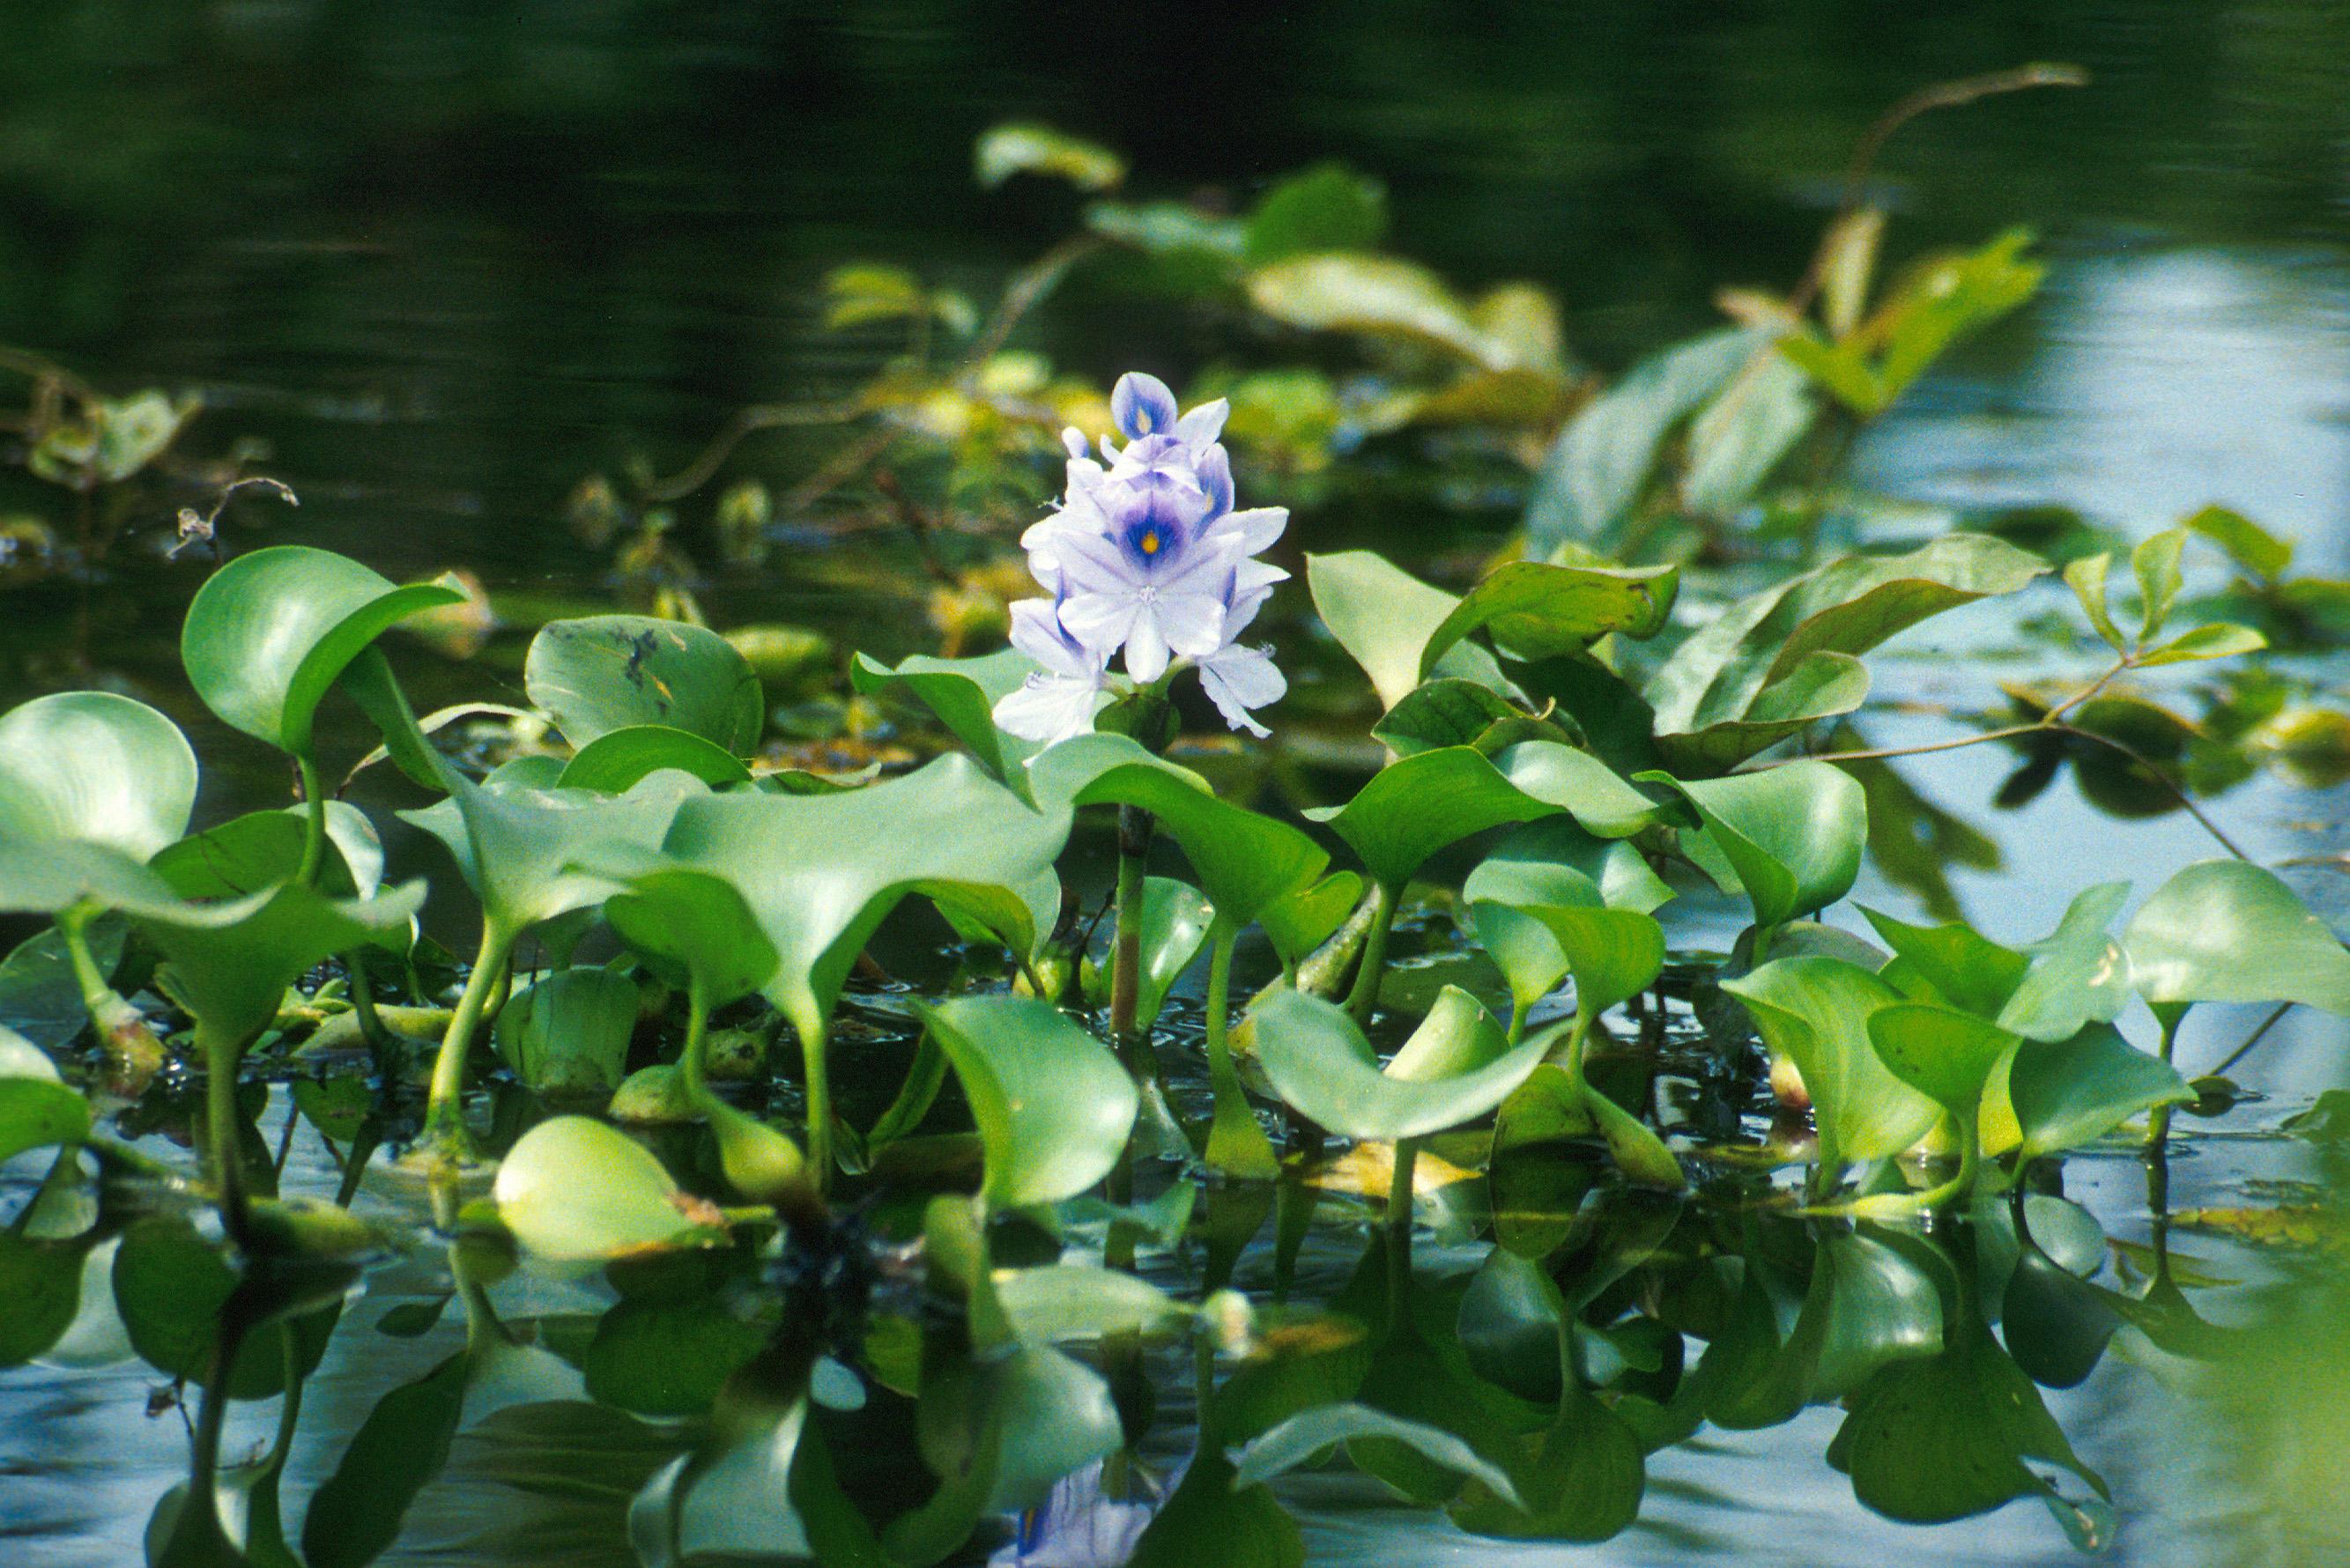 1000+ images about Plantas Hiperacumuladoras on Pinterest.